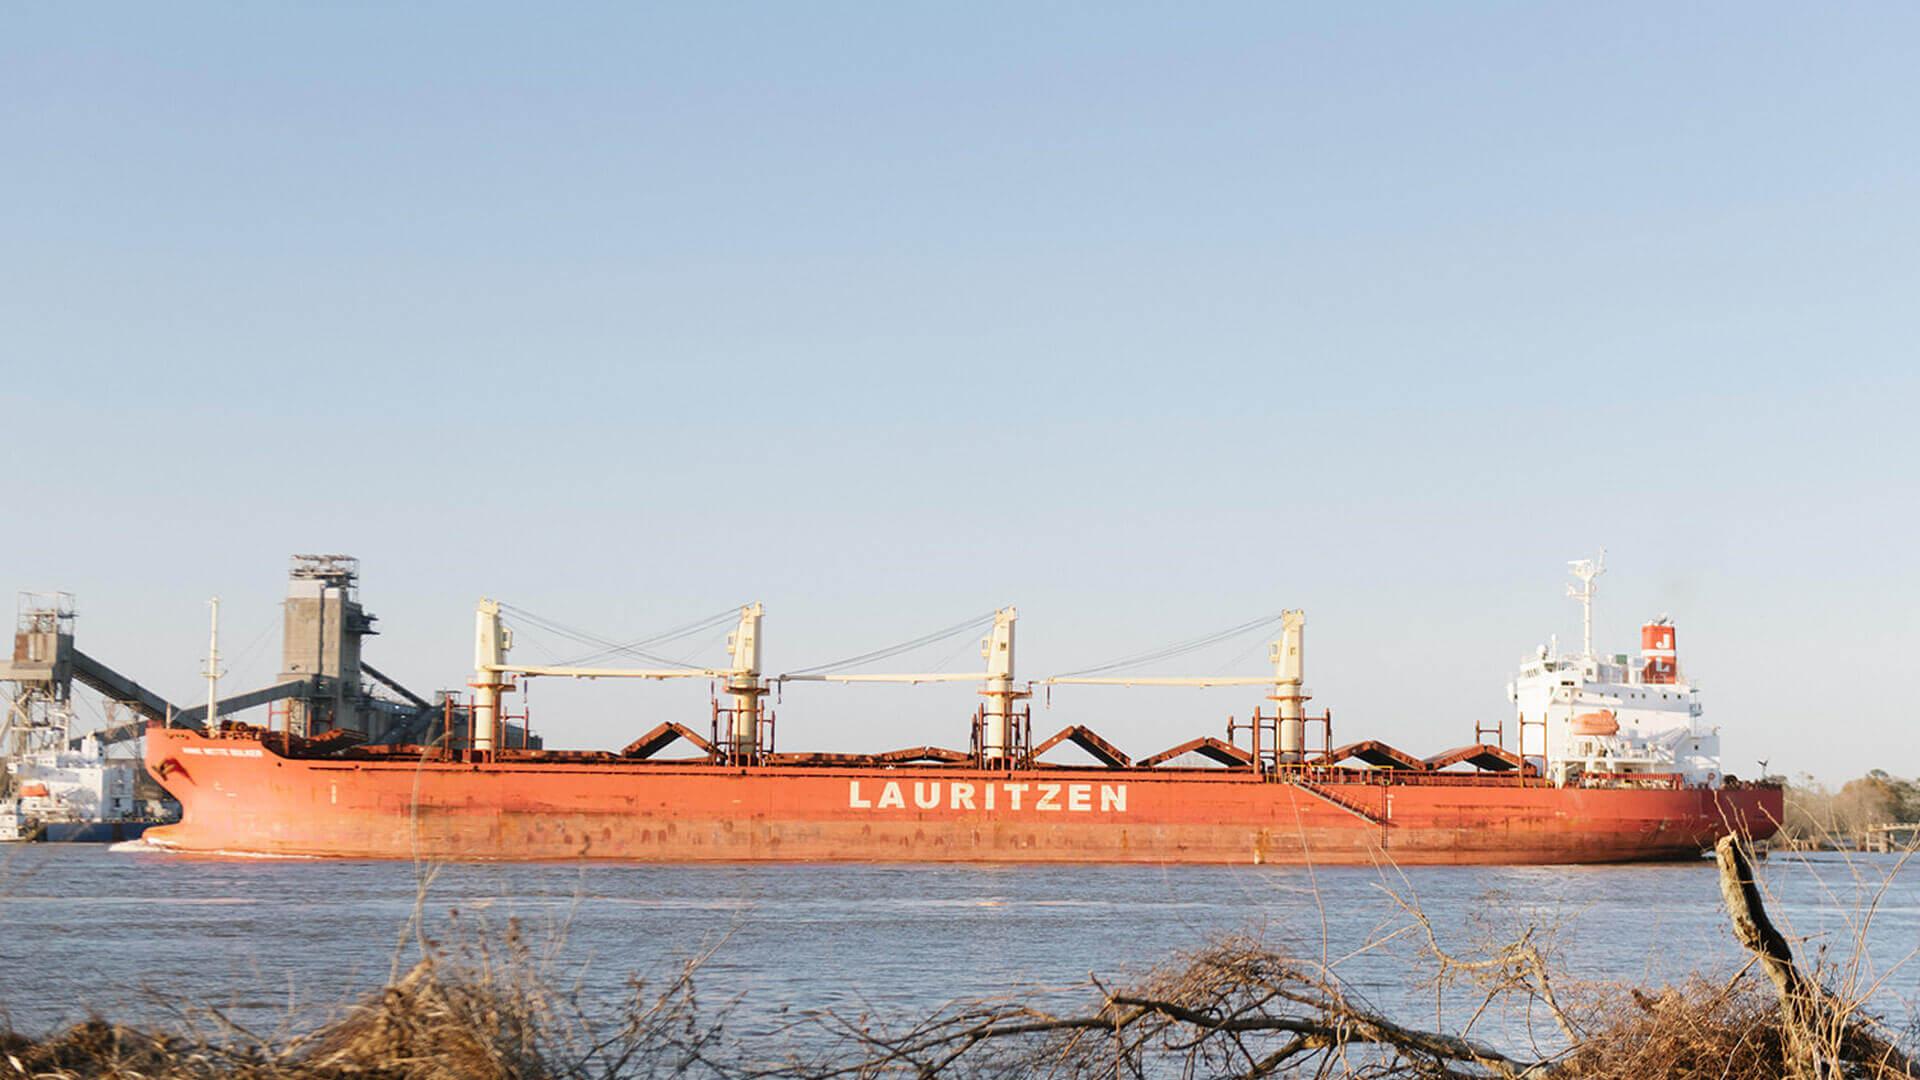 Barge on The Mississippi River.